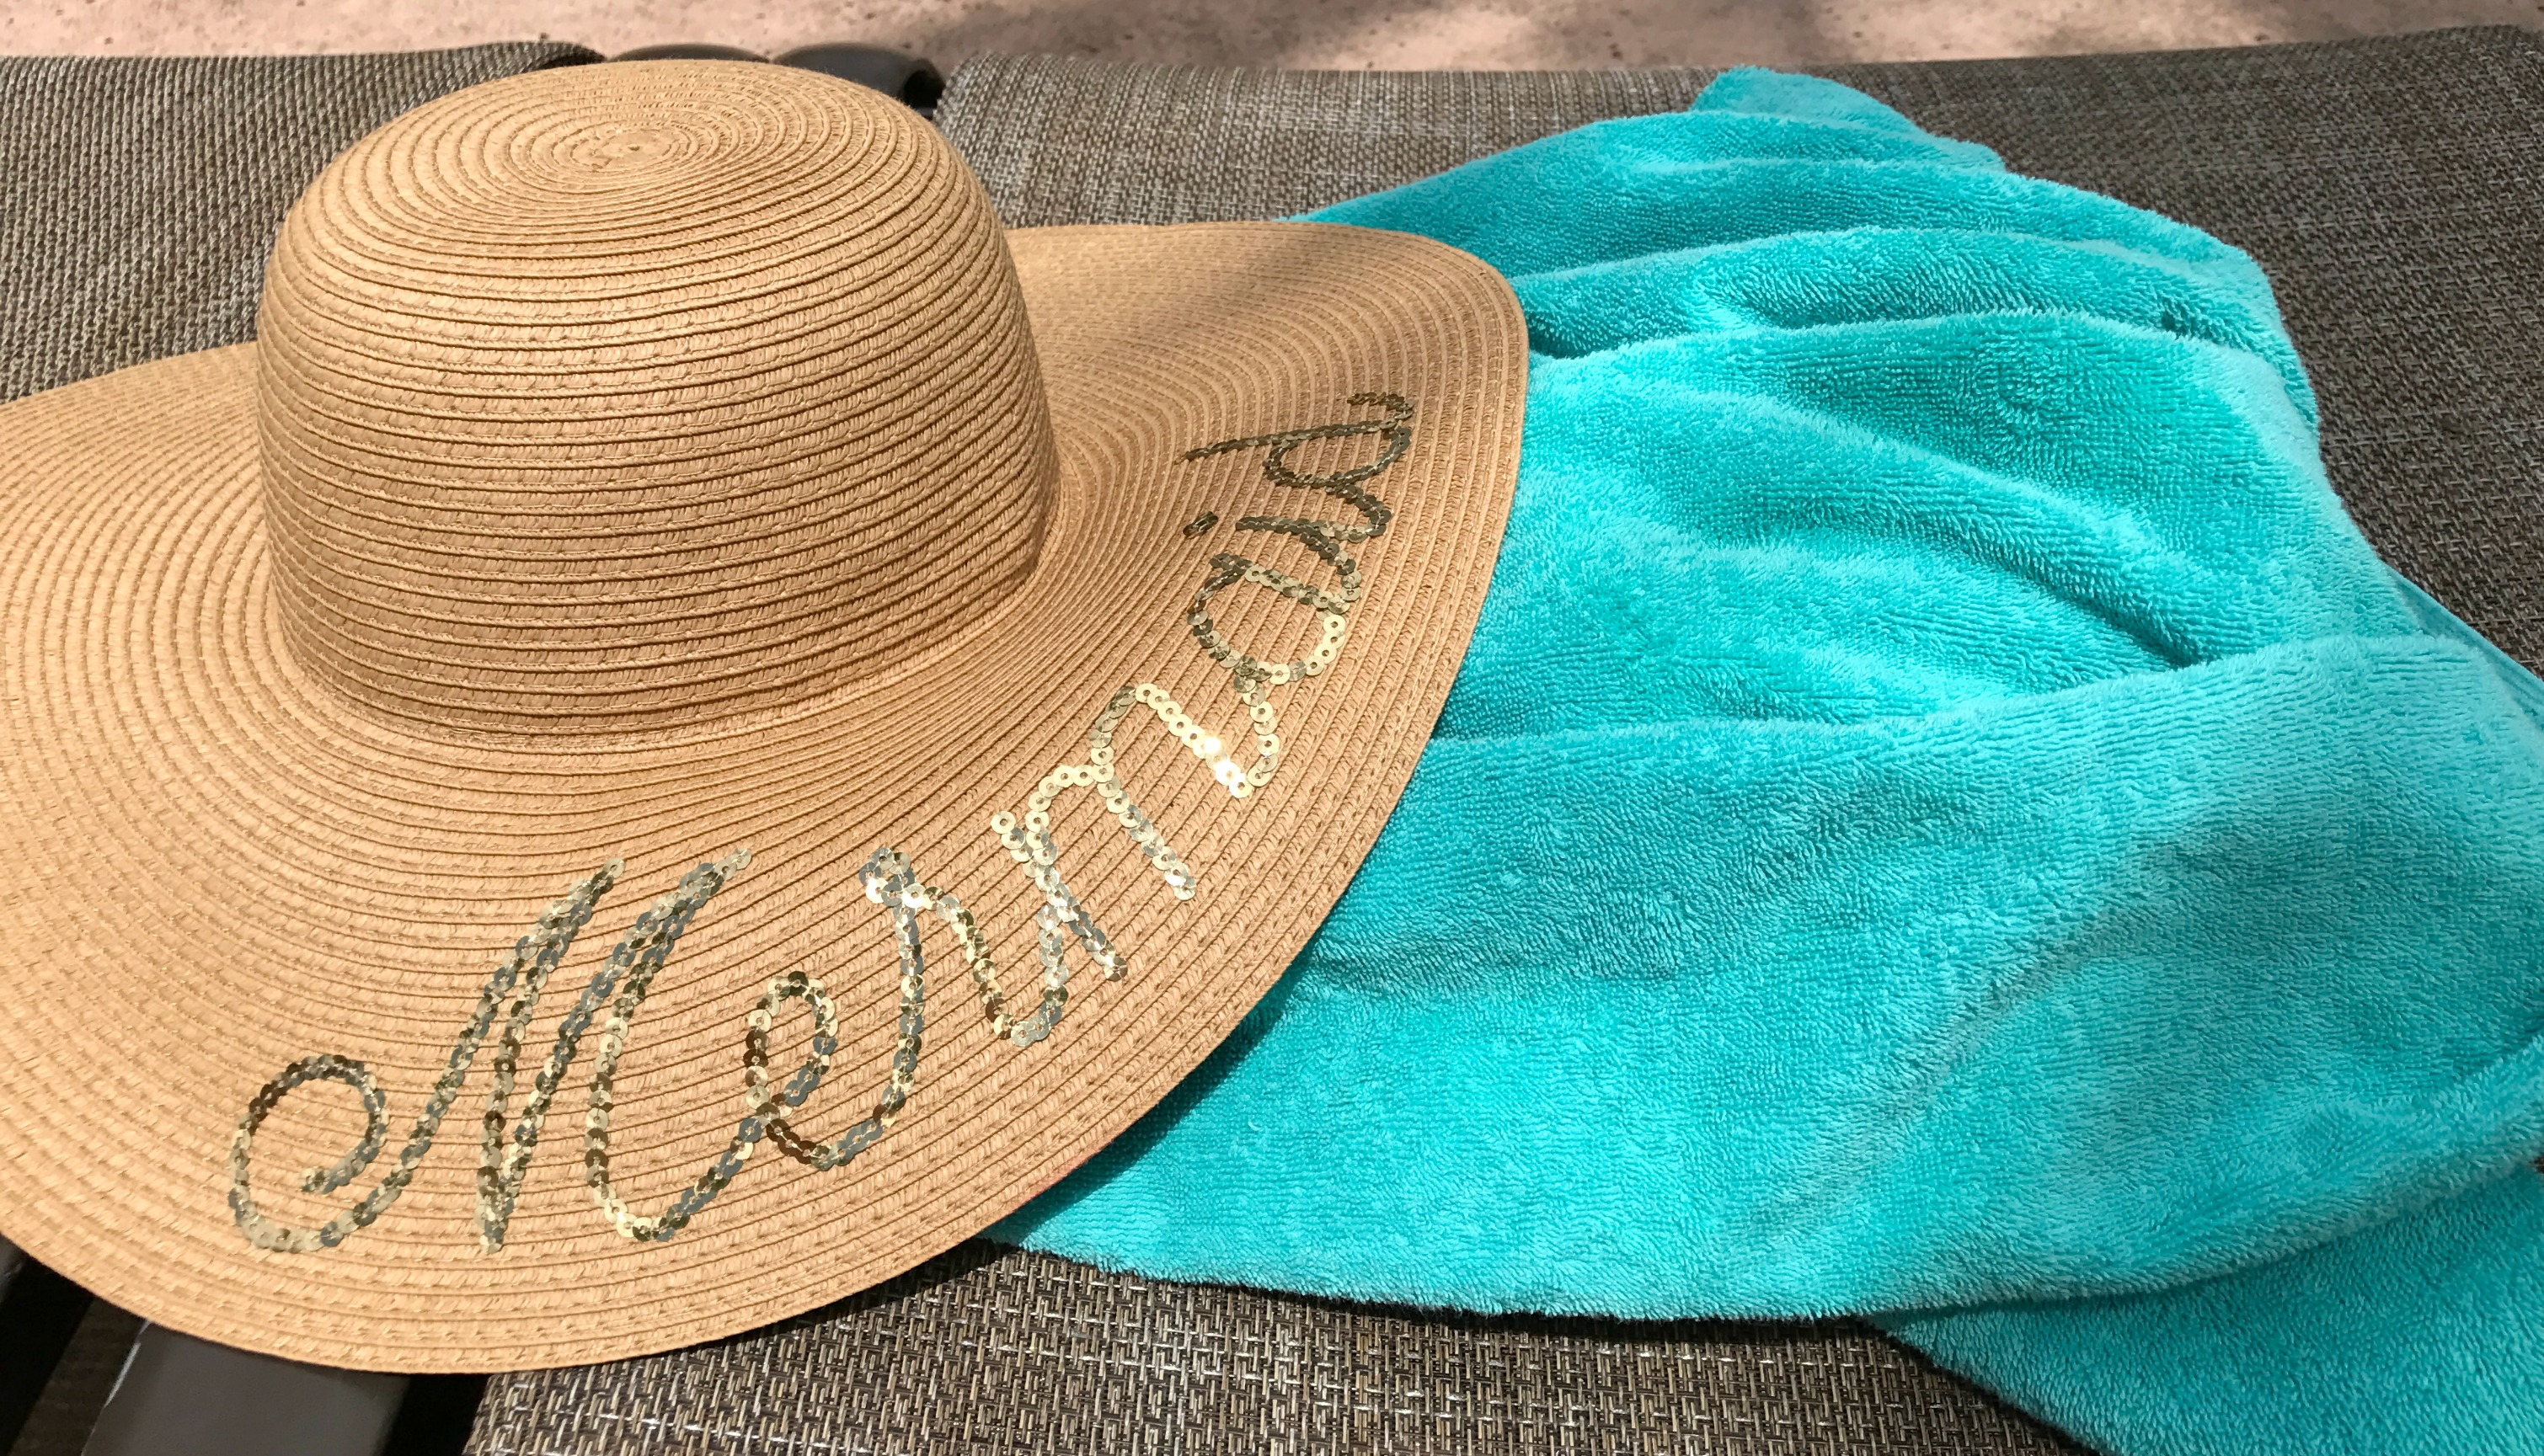 Hilton-bonnet-creek-review-family-disney-resort-pooltowels